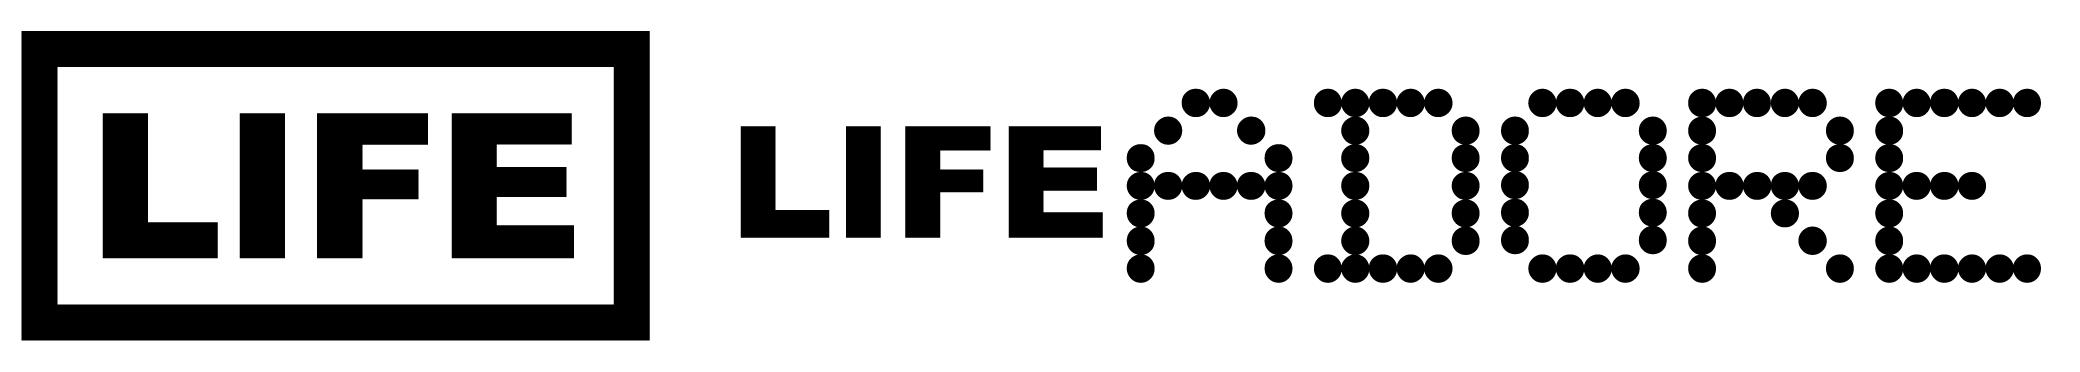 LIFE / LIFE ADORE Homepage logo